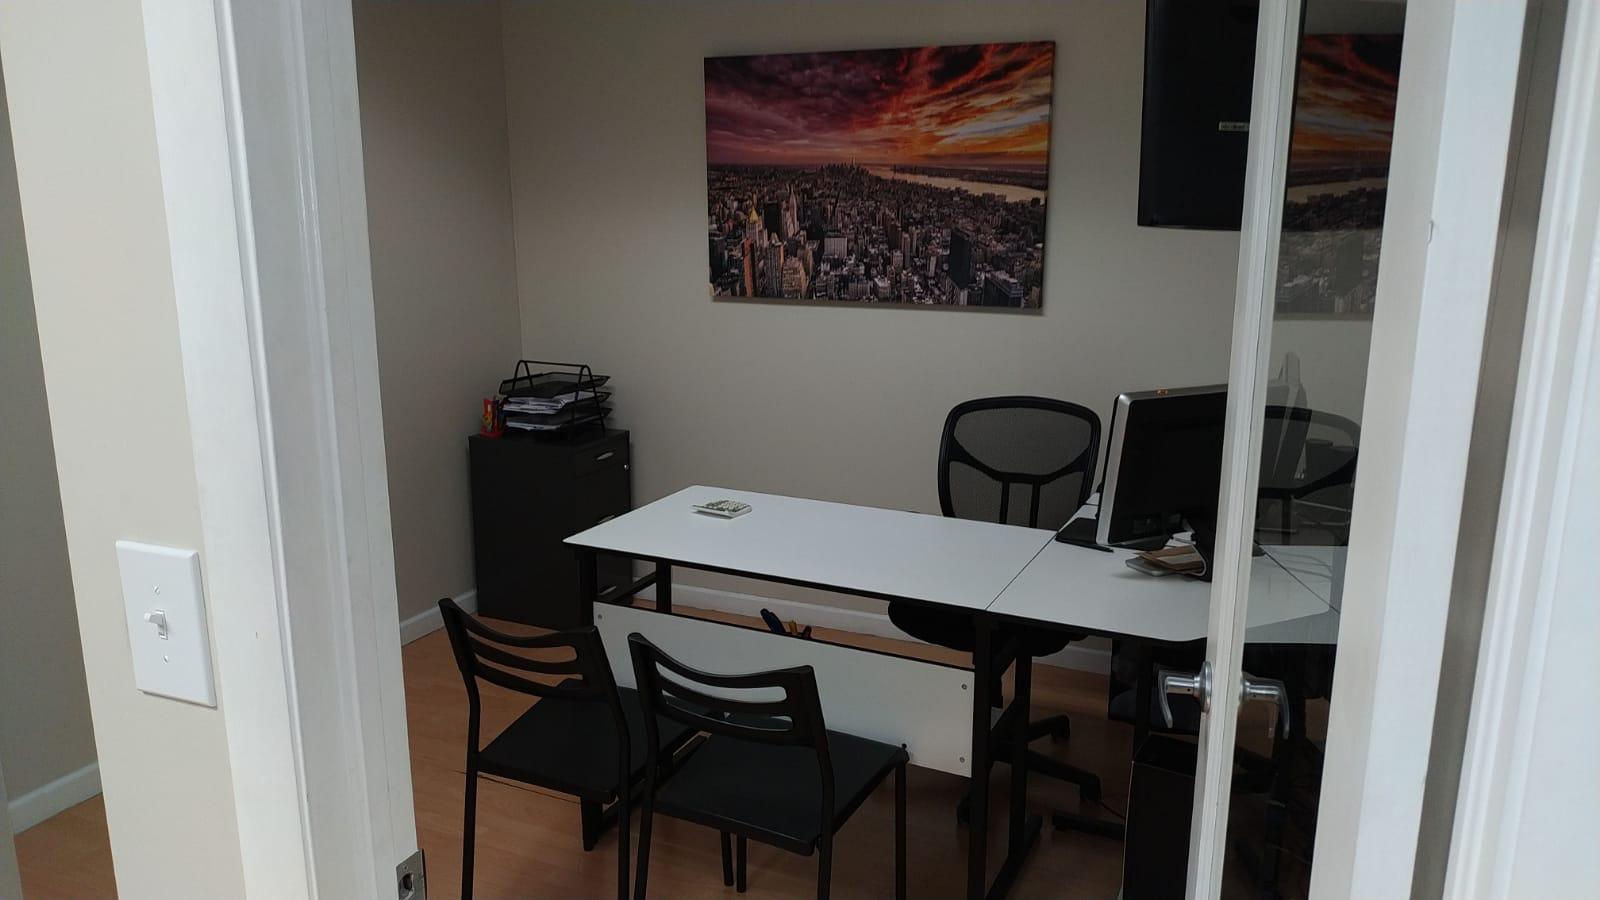 up-office-image-13.jpg